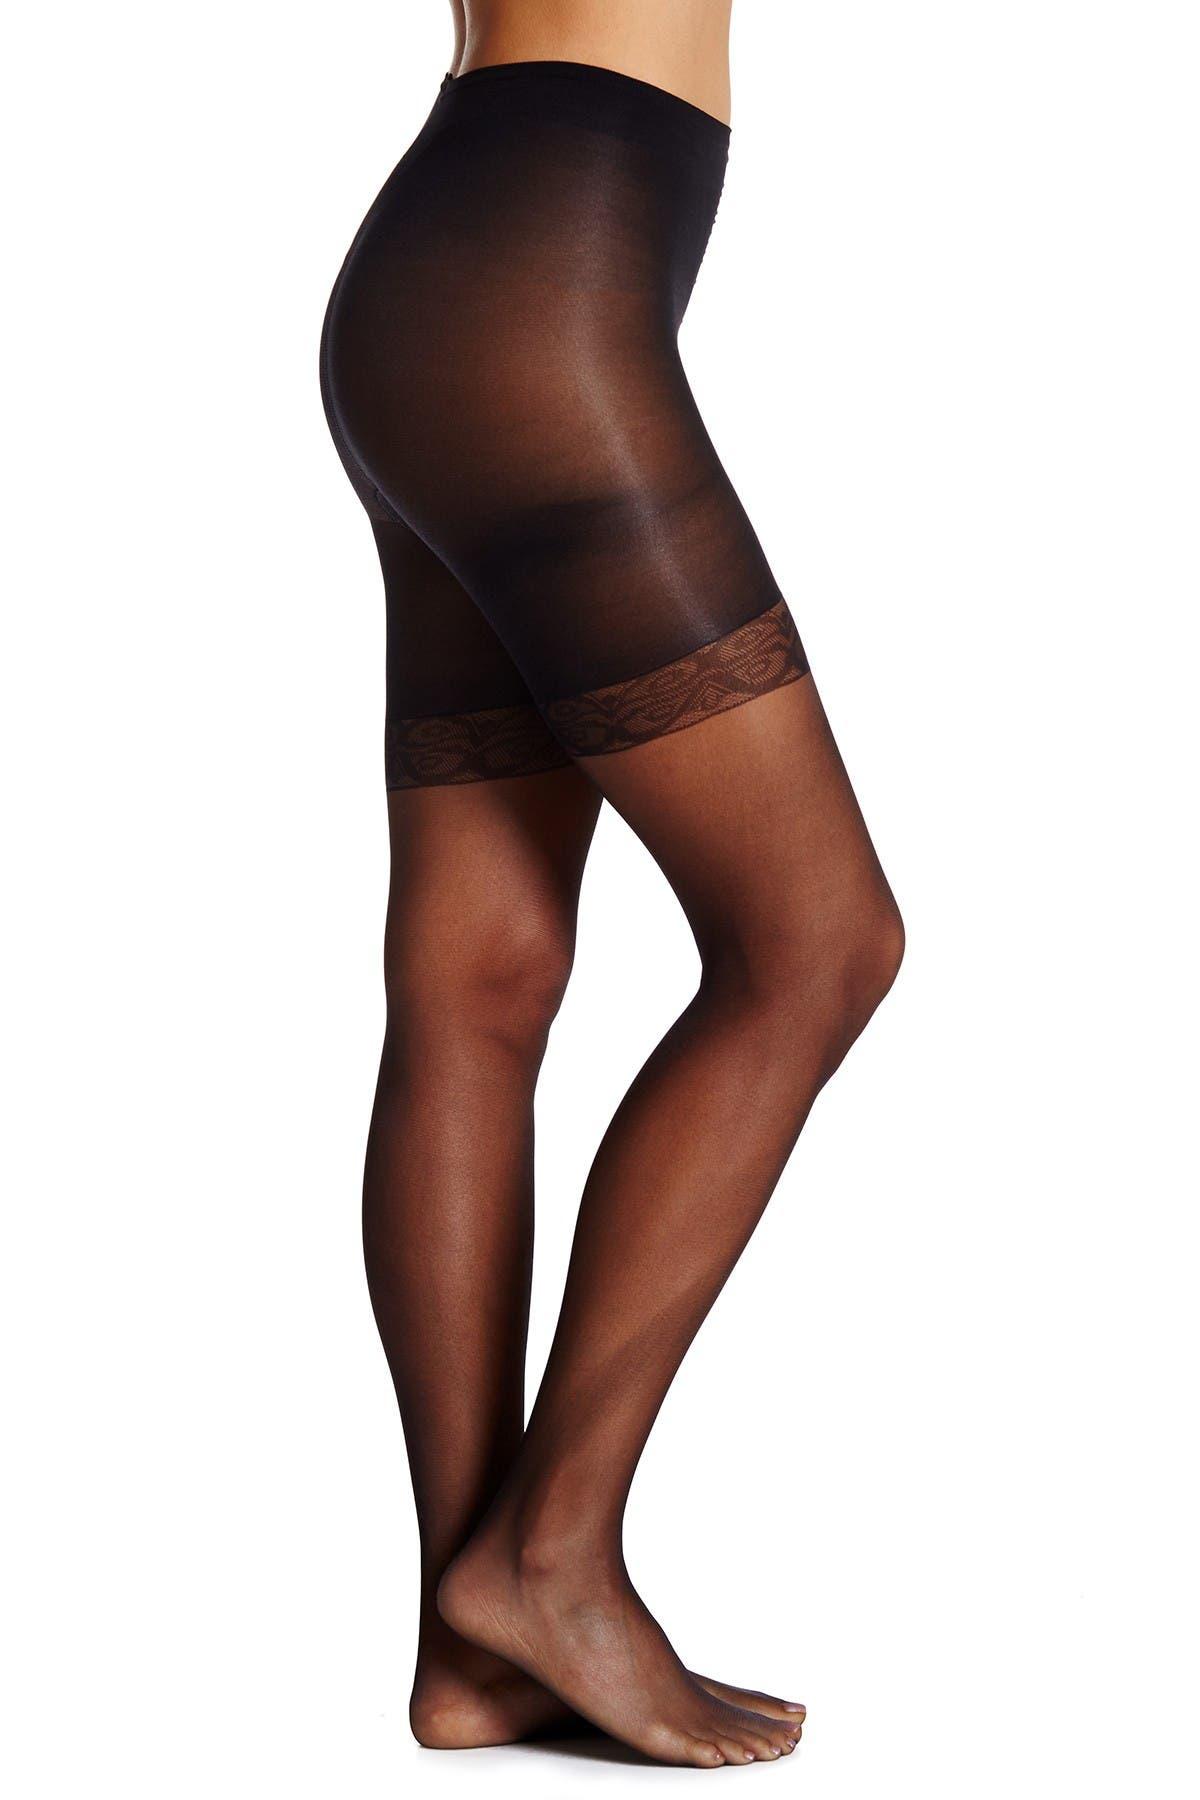 Image of shimera Everyday Sheer Mid-Thigh Shaper Pantyhose